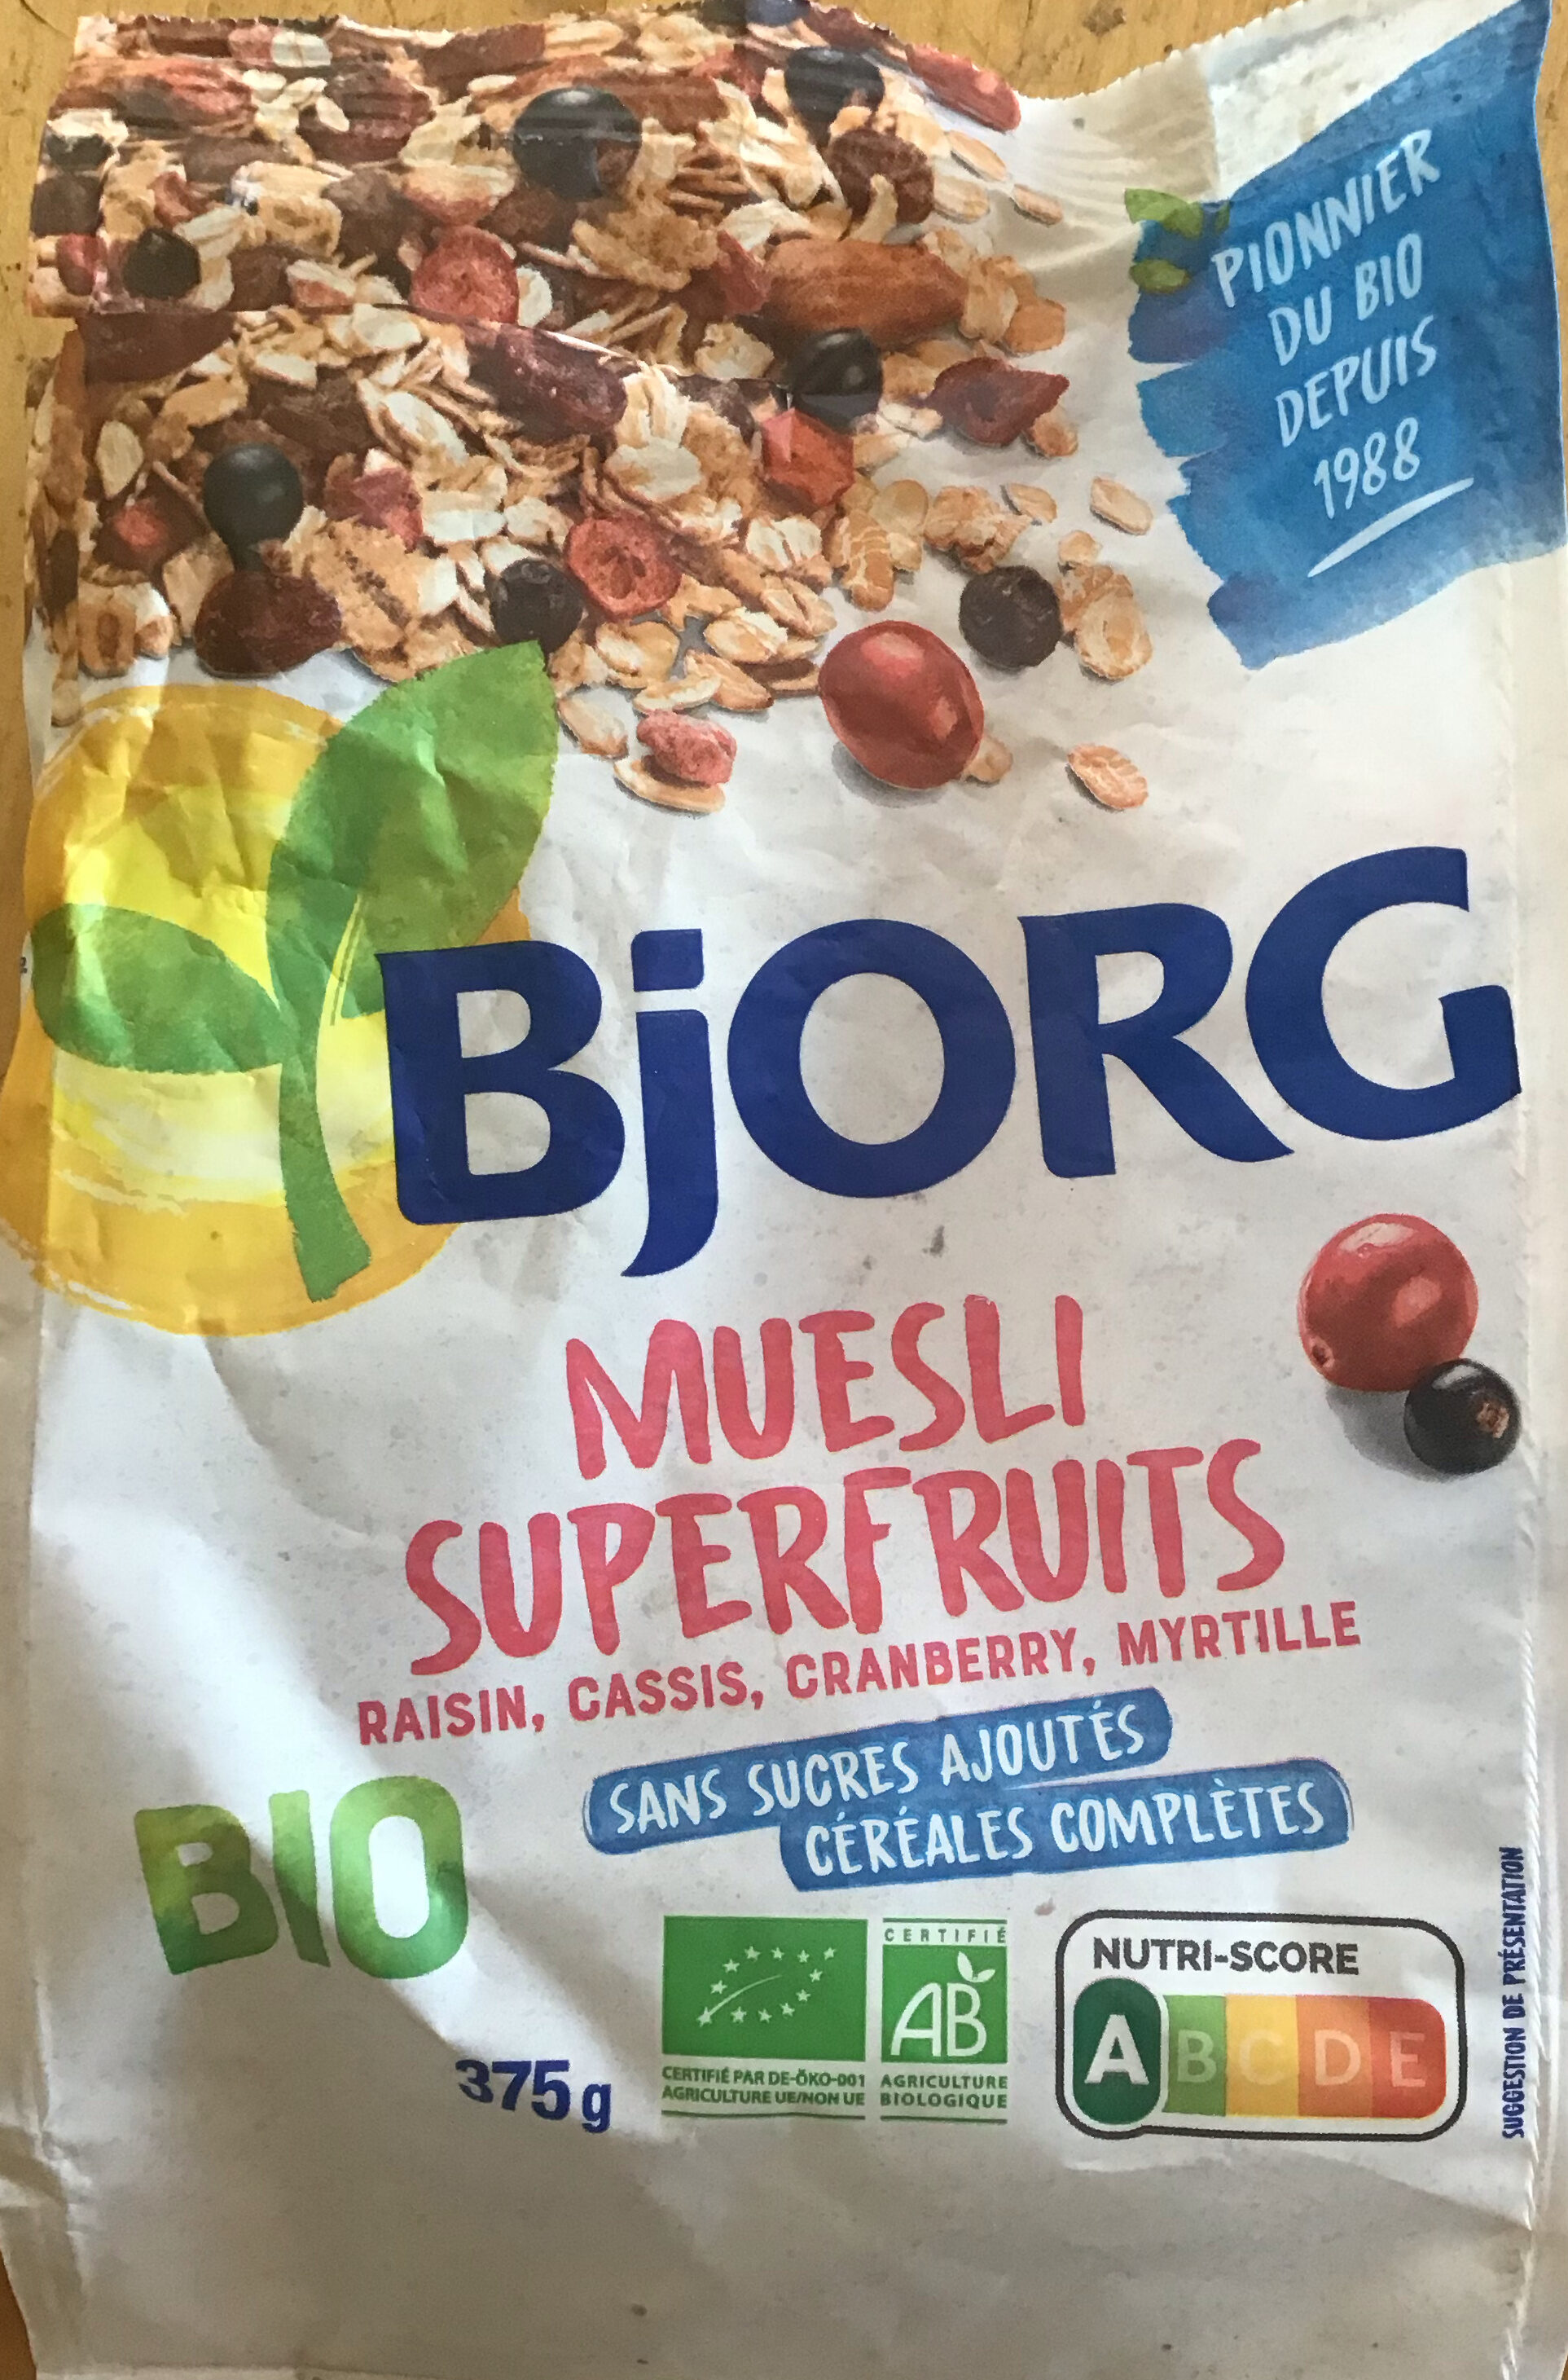 Muesli Superfruits Raisin Cassis Cranberry Myrtille - Producto - fr